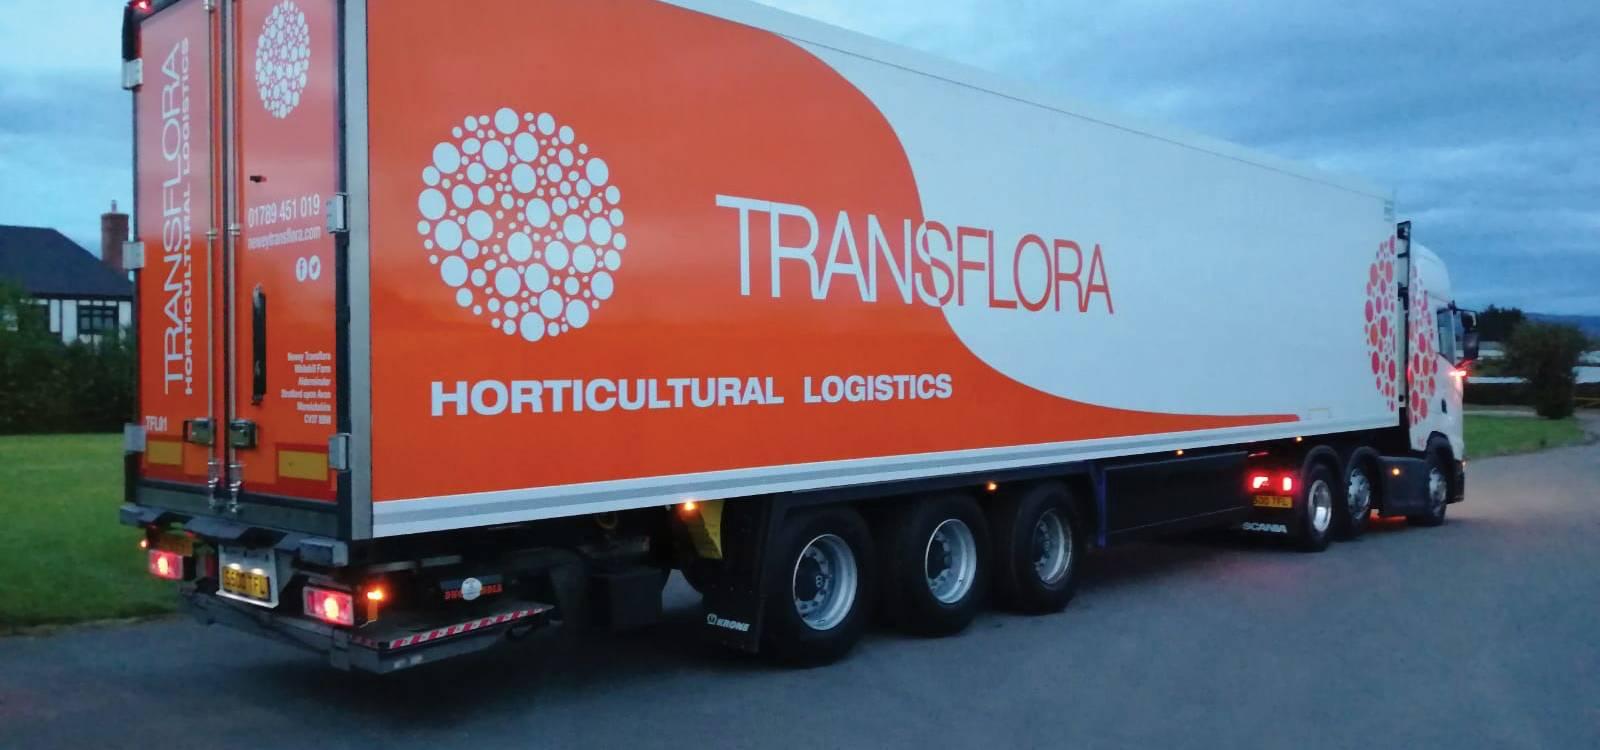 transflora-lorry-three-quarter-view.jpg